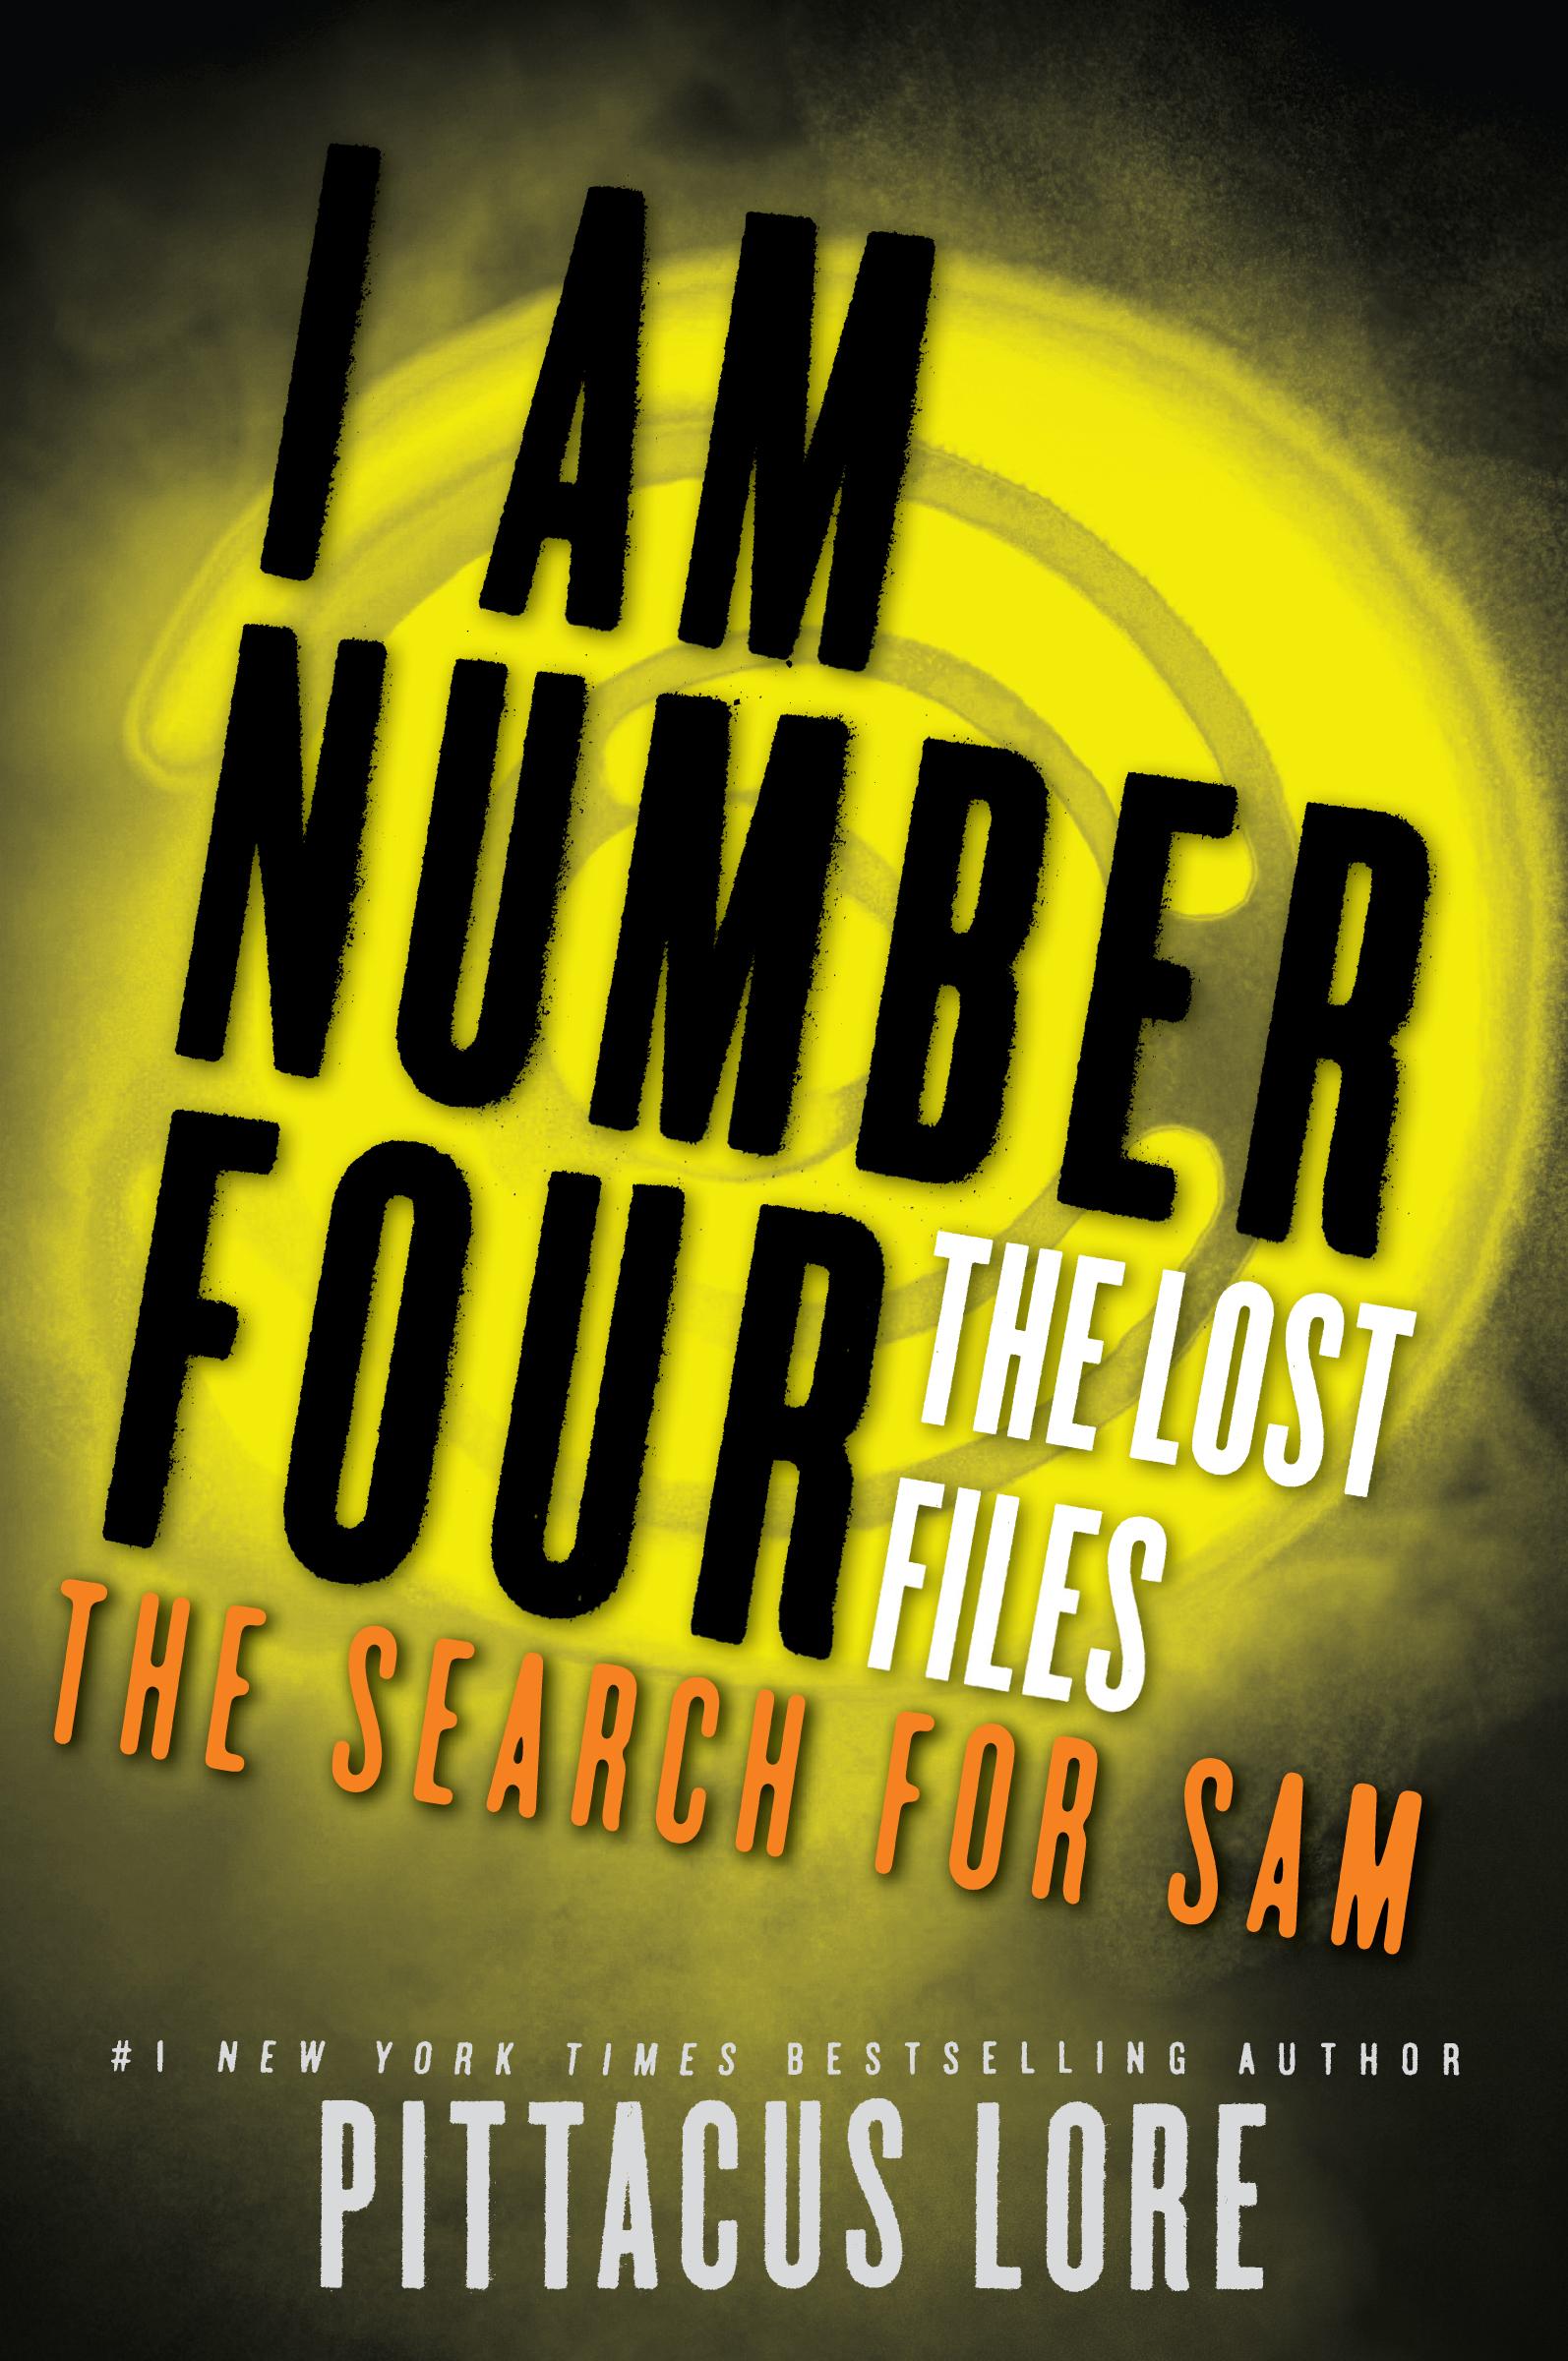 RayShappell_IANF LF4 Search for Sam.jpg